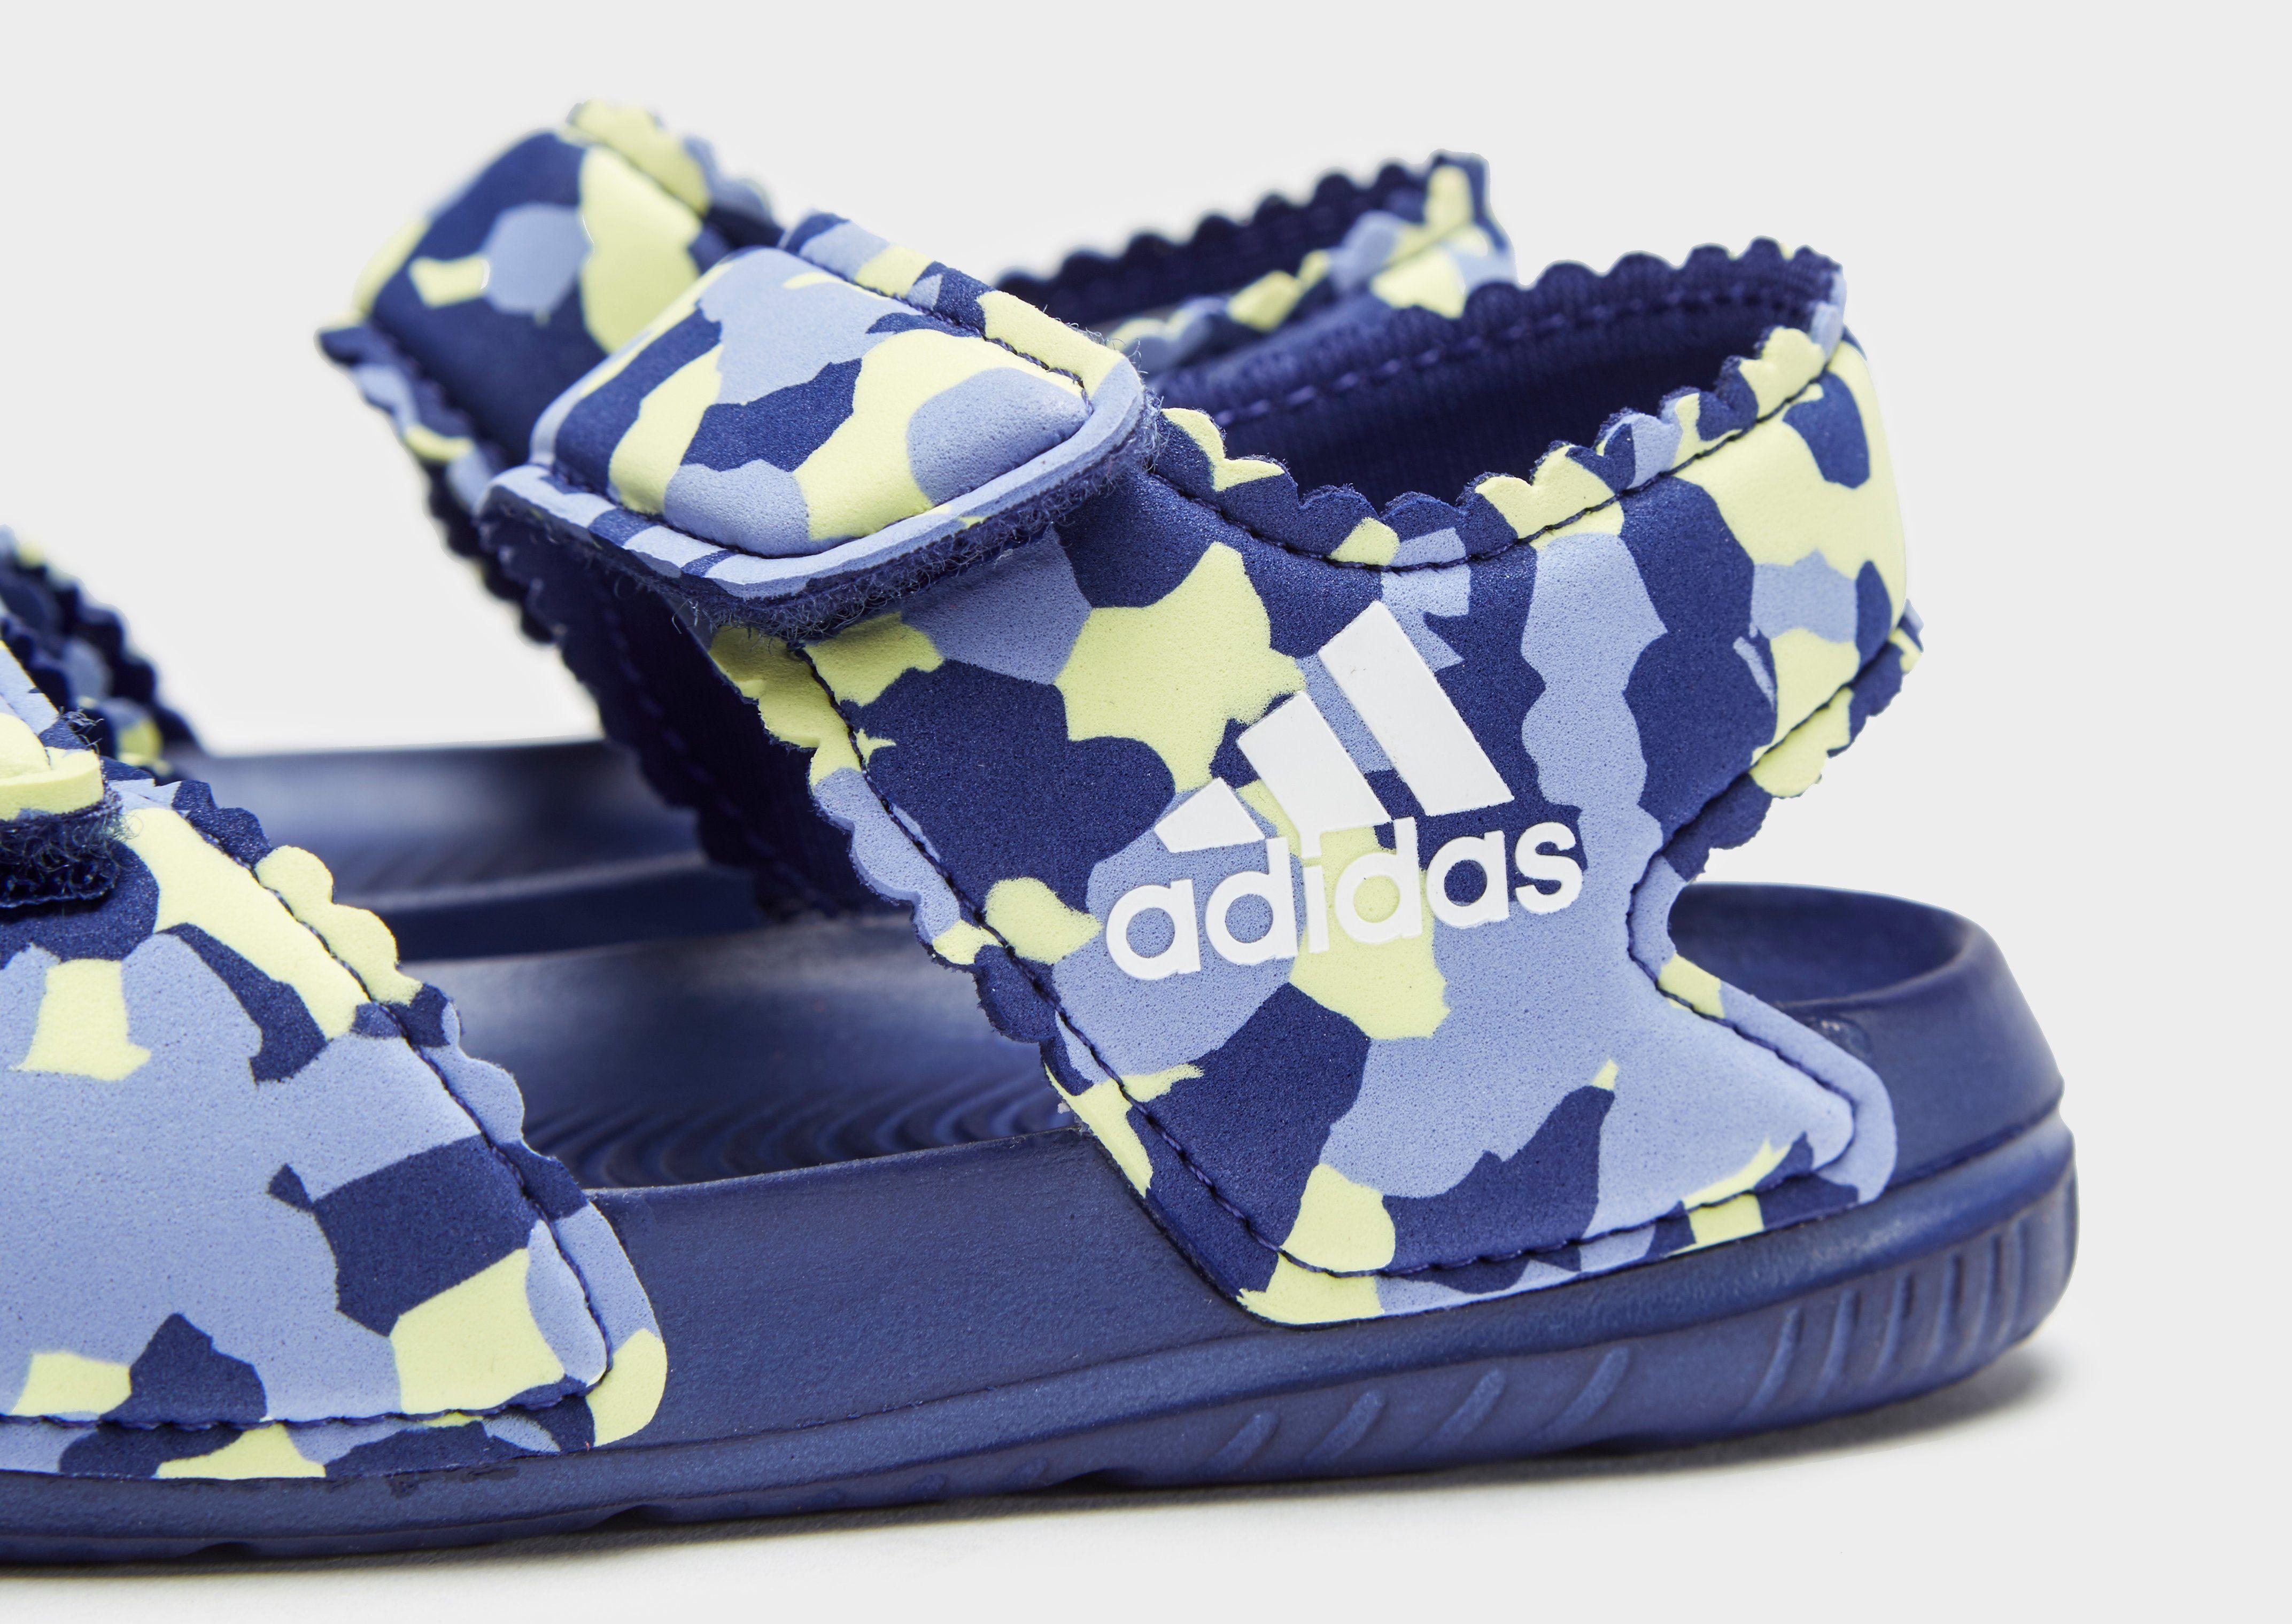 adidas AltaSwim Sandals Infant Lila Freies Verschiffen Visum Zahlung saGBtP